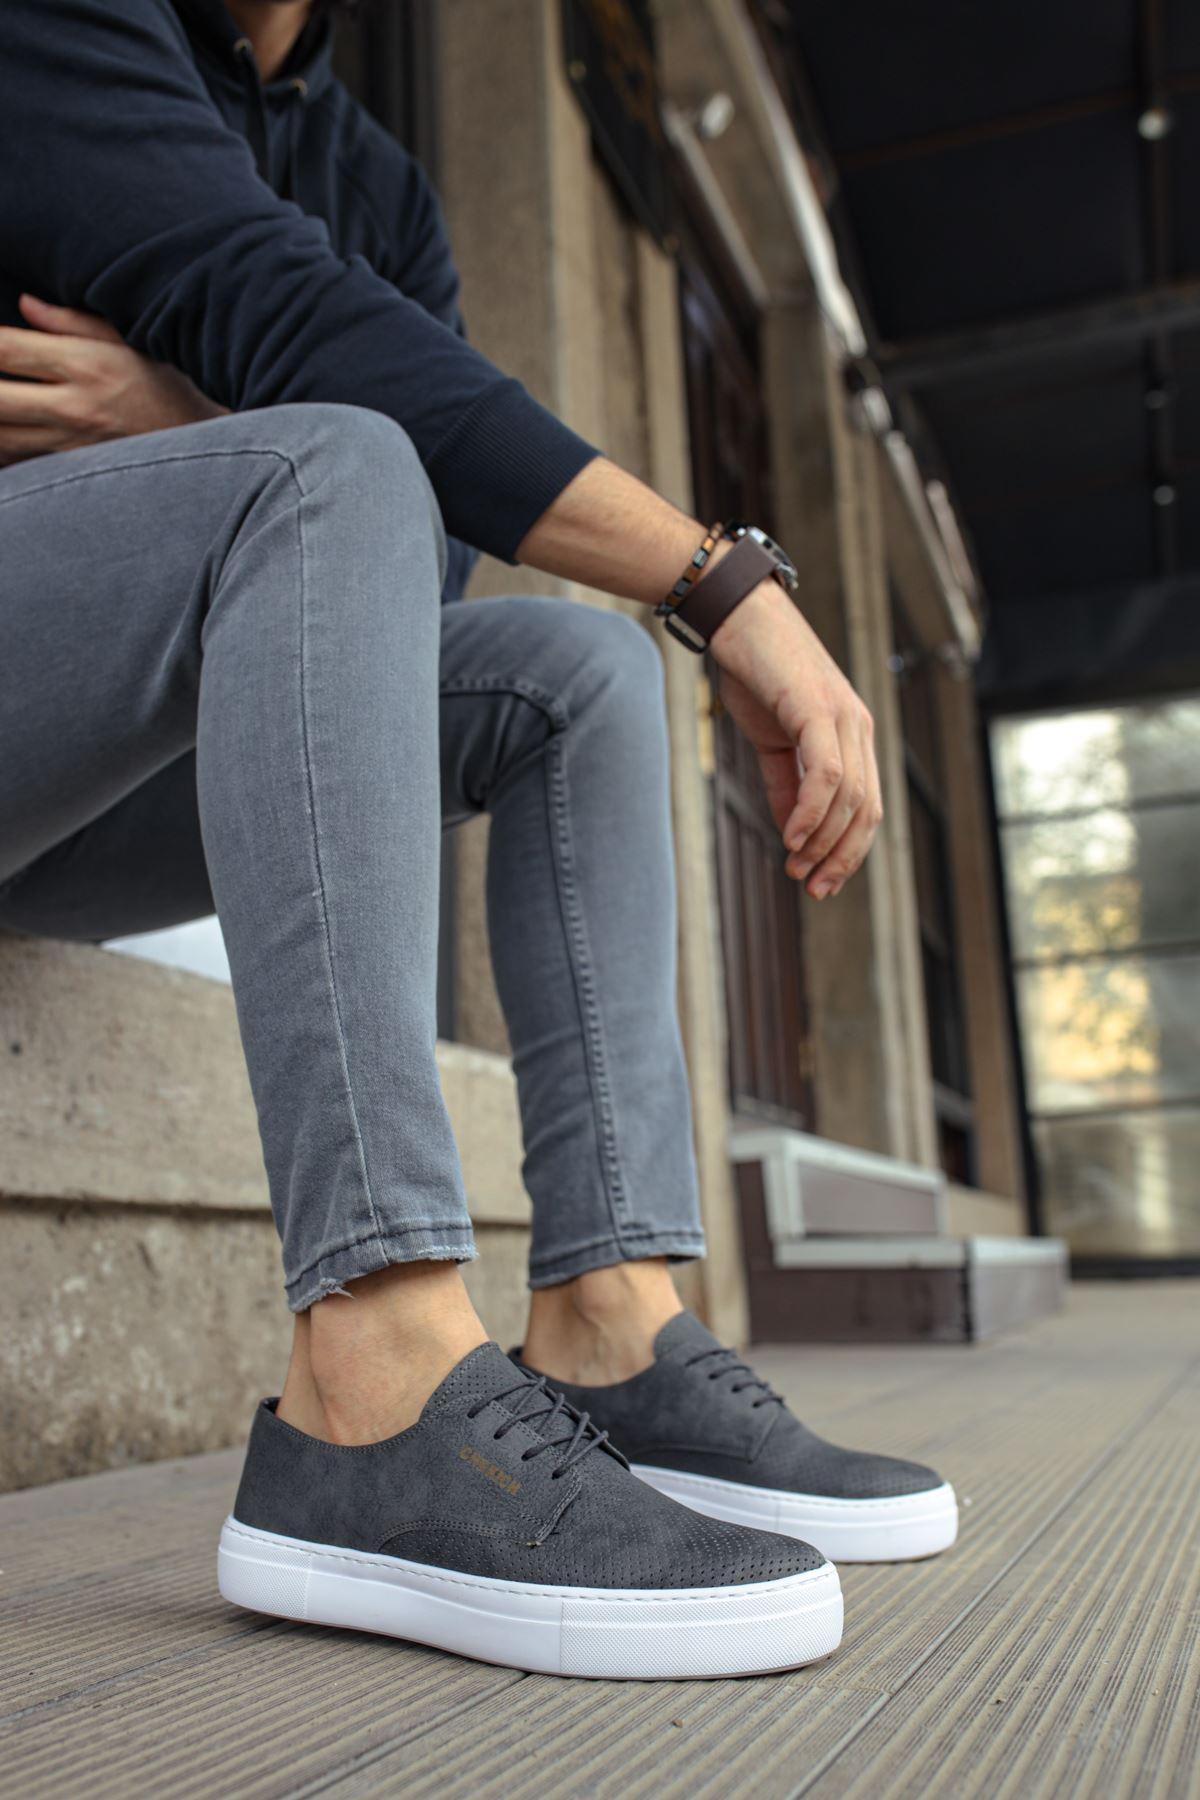 Chekich CH061 BT Erkek Ayakkabı ANTRASIT